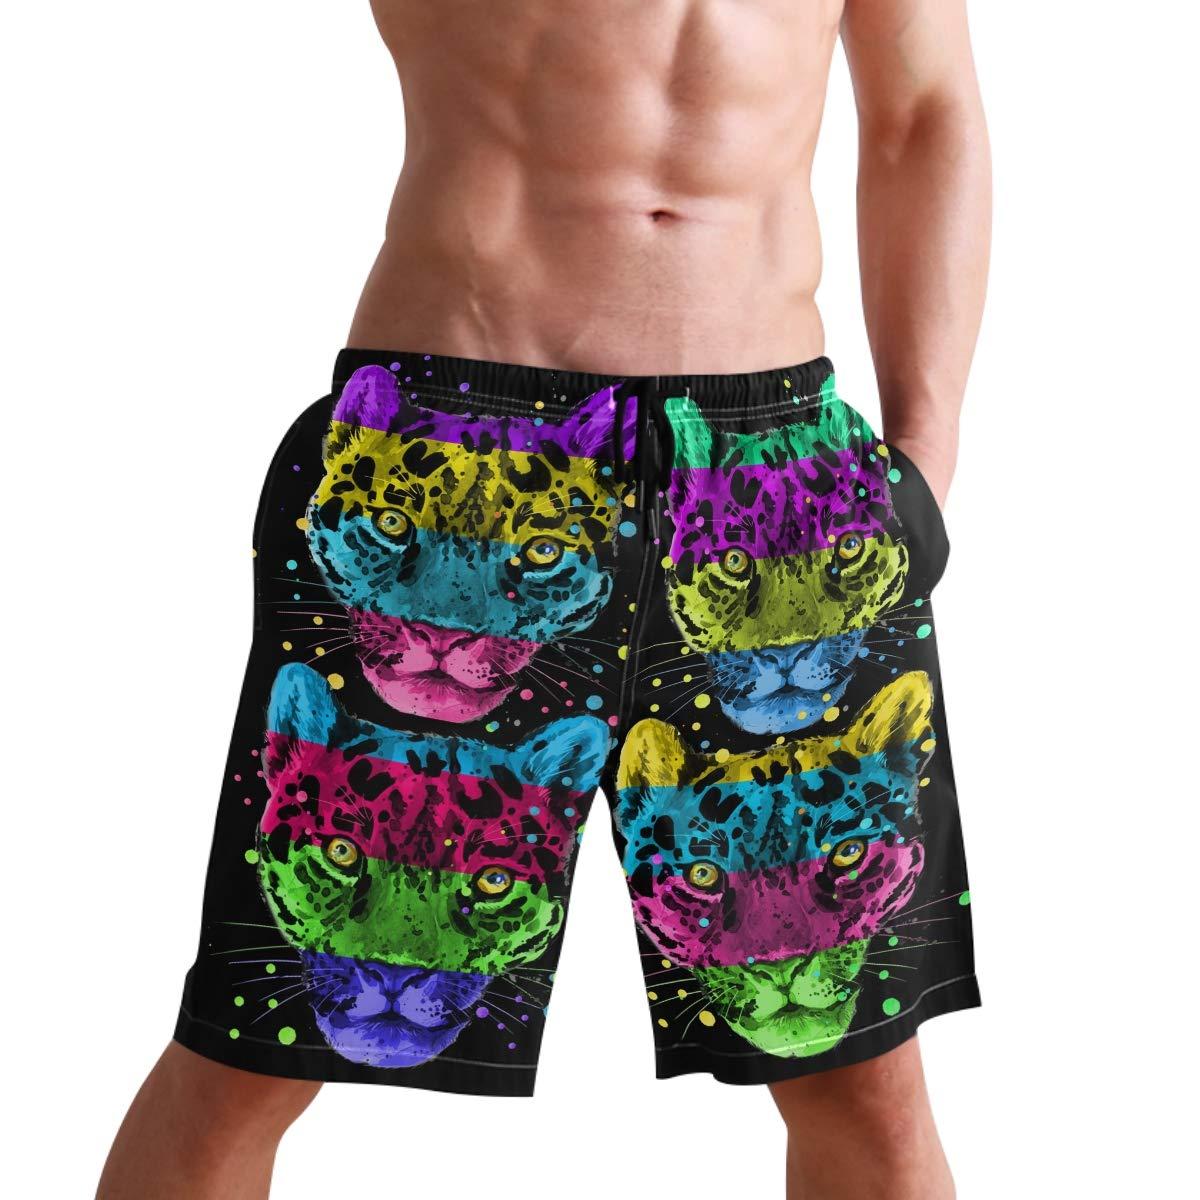 Mens Swim Trunks Splash Jaguar Leopard Colorful Beach Board Shorts with Lining